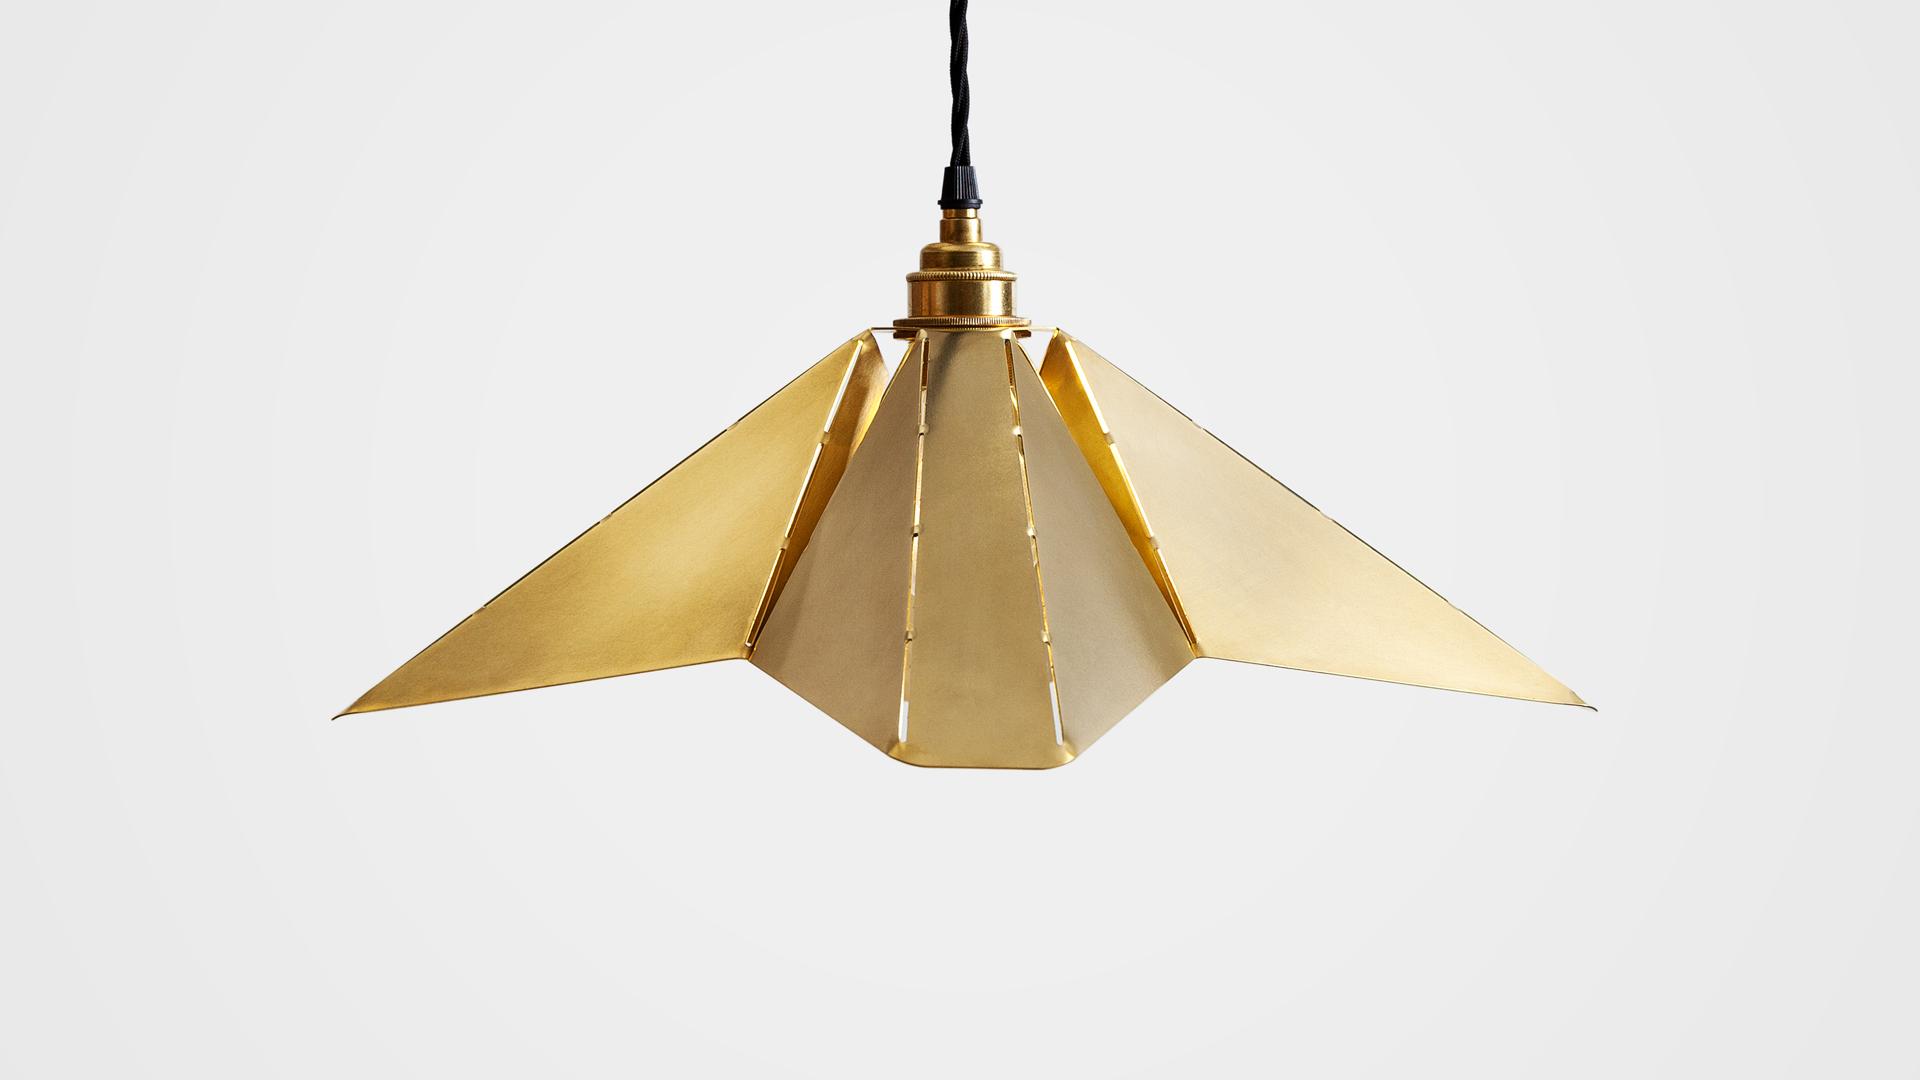 unusual pendant lighting. Unusual Ceiling Lighting. Geometric Light Shade   Lights Modern Pendant Lighting E L